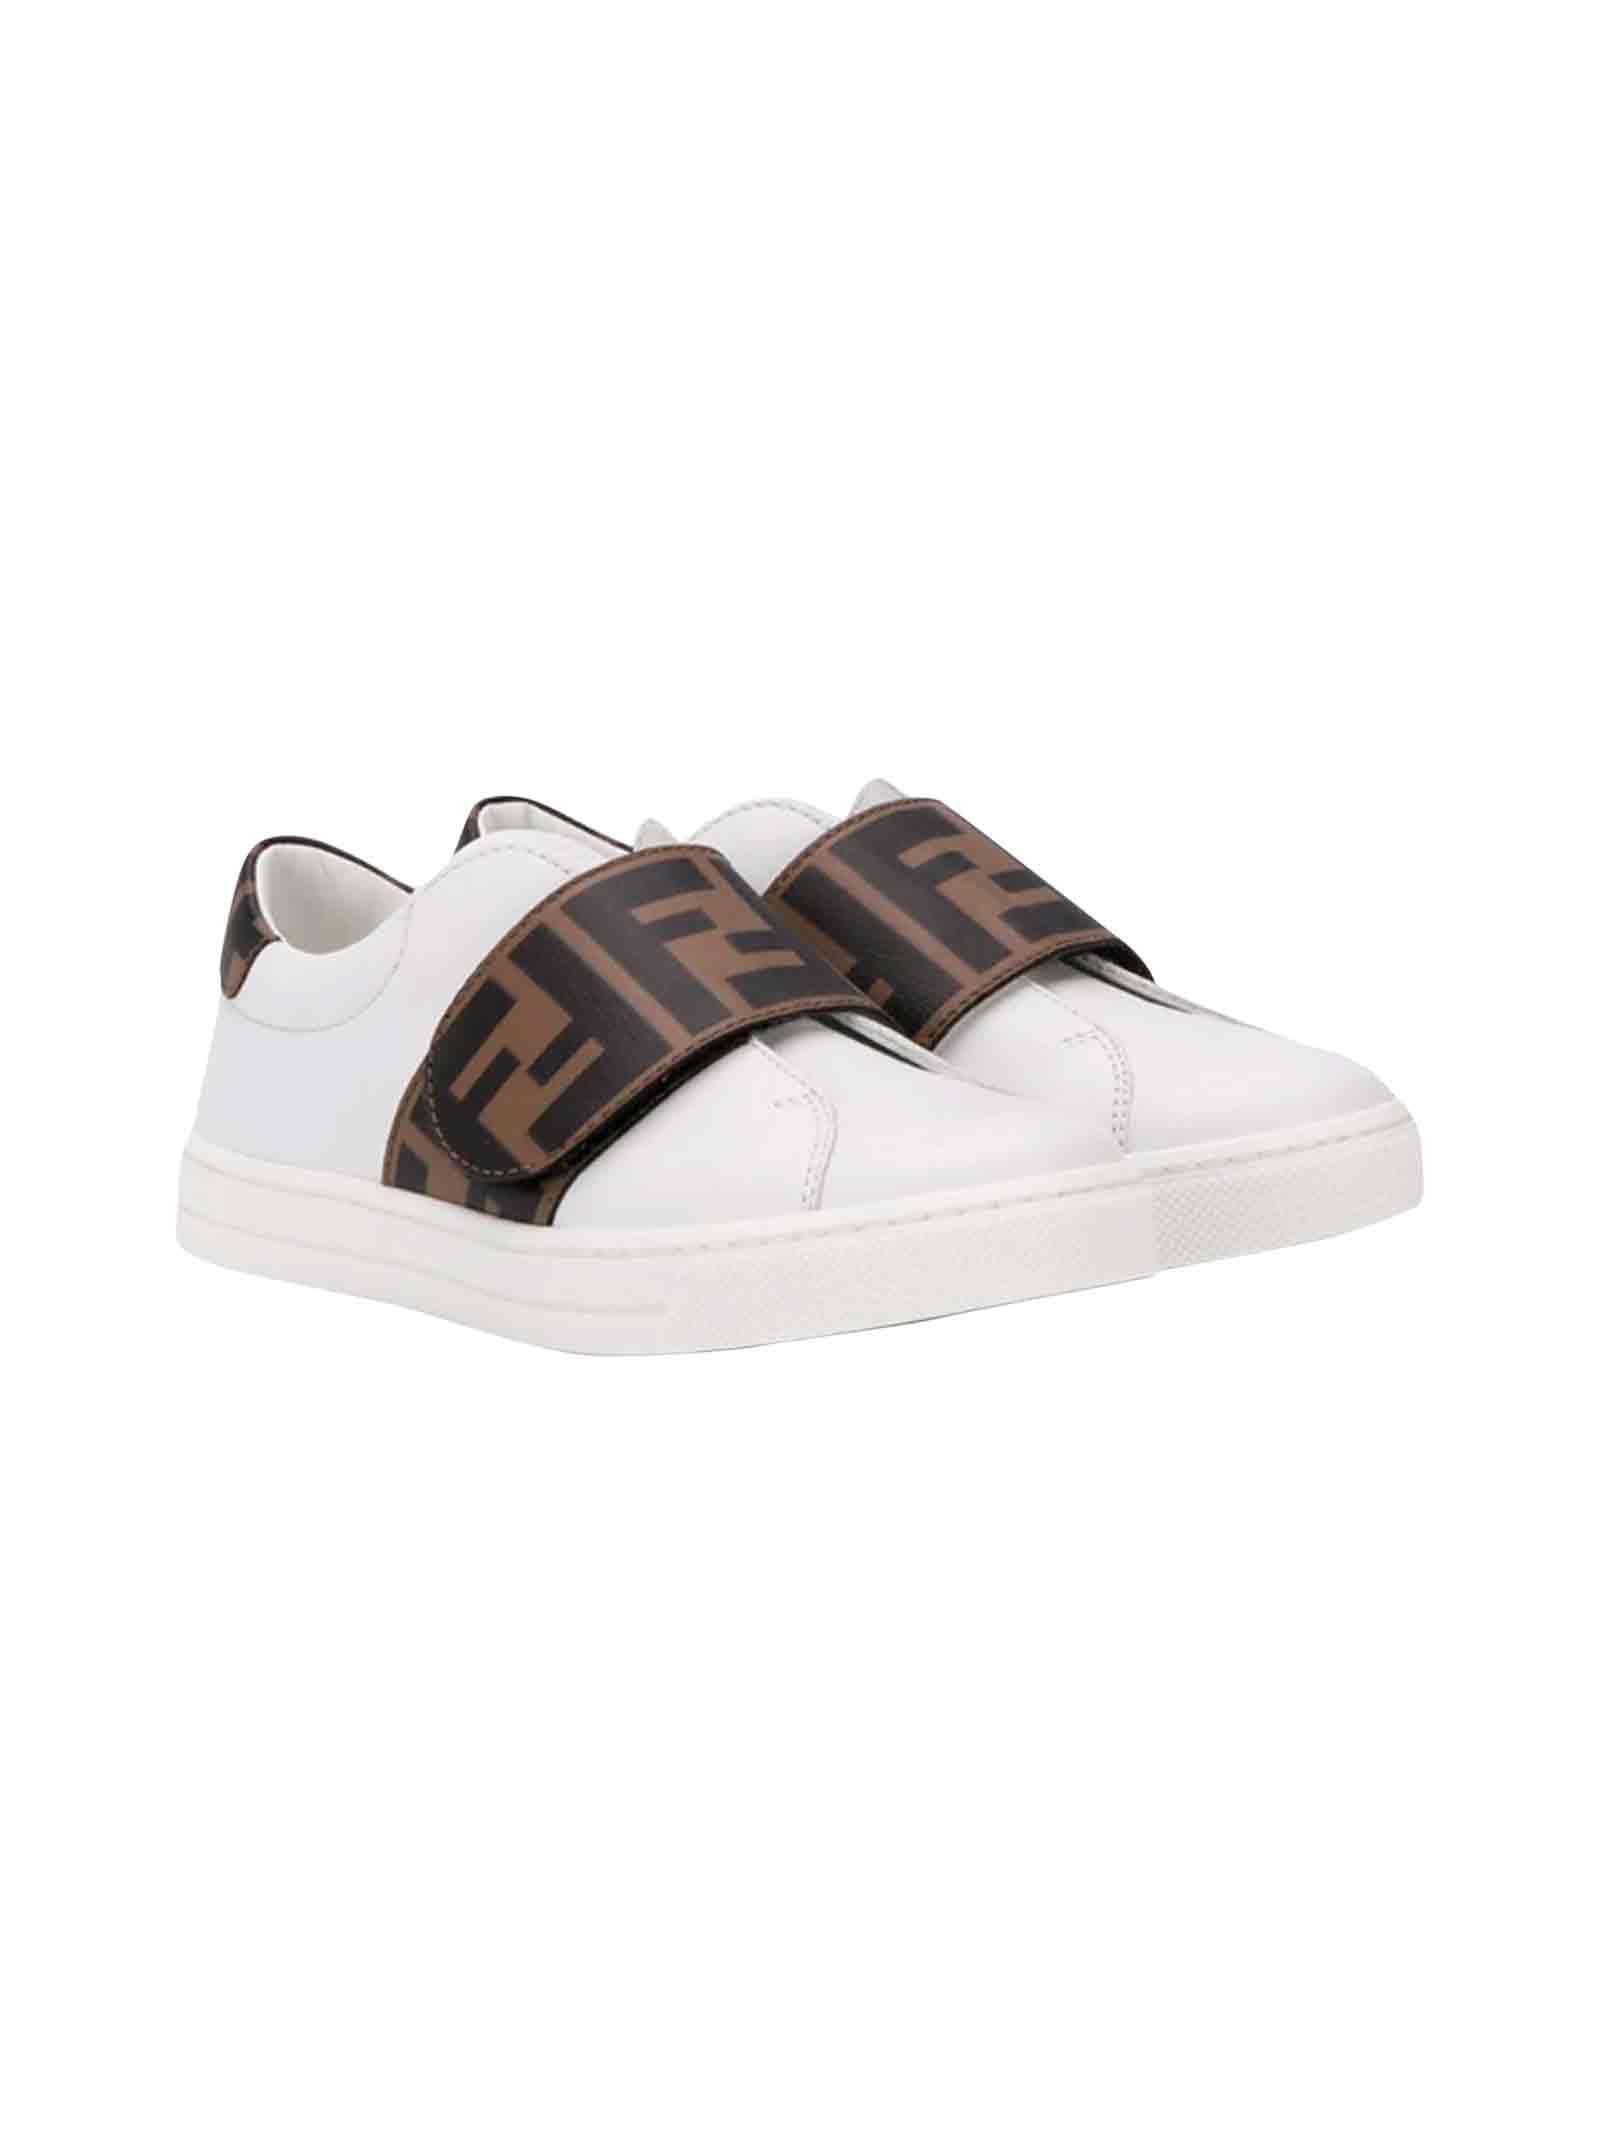 finest selection 86fe1 478e4 Fendi kids white sneakers